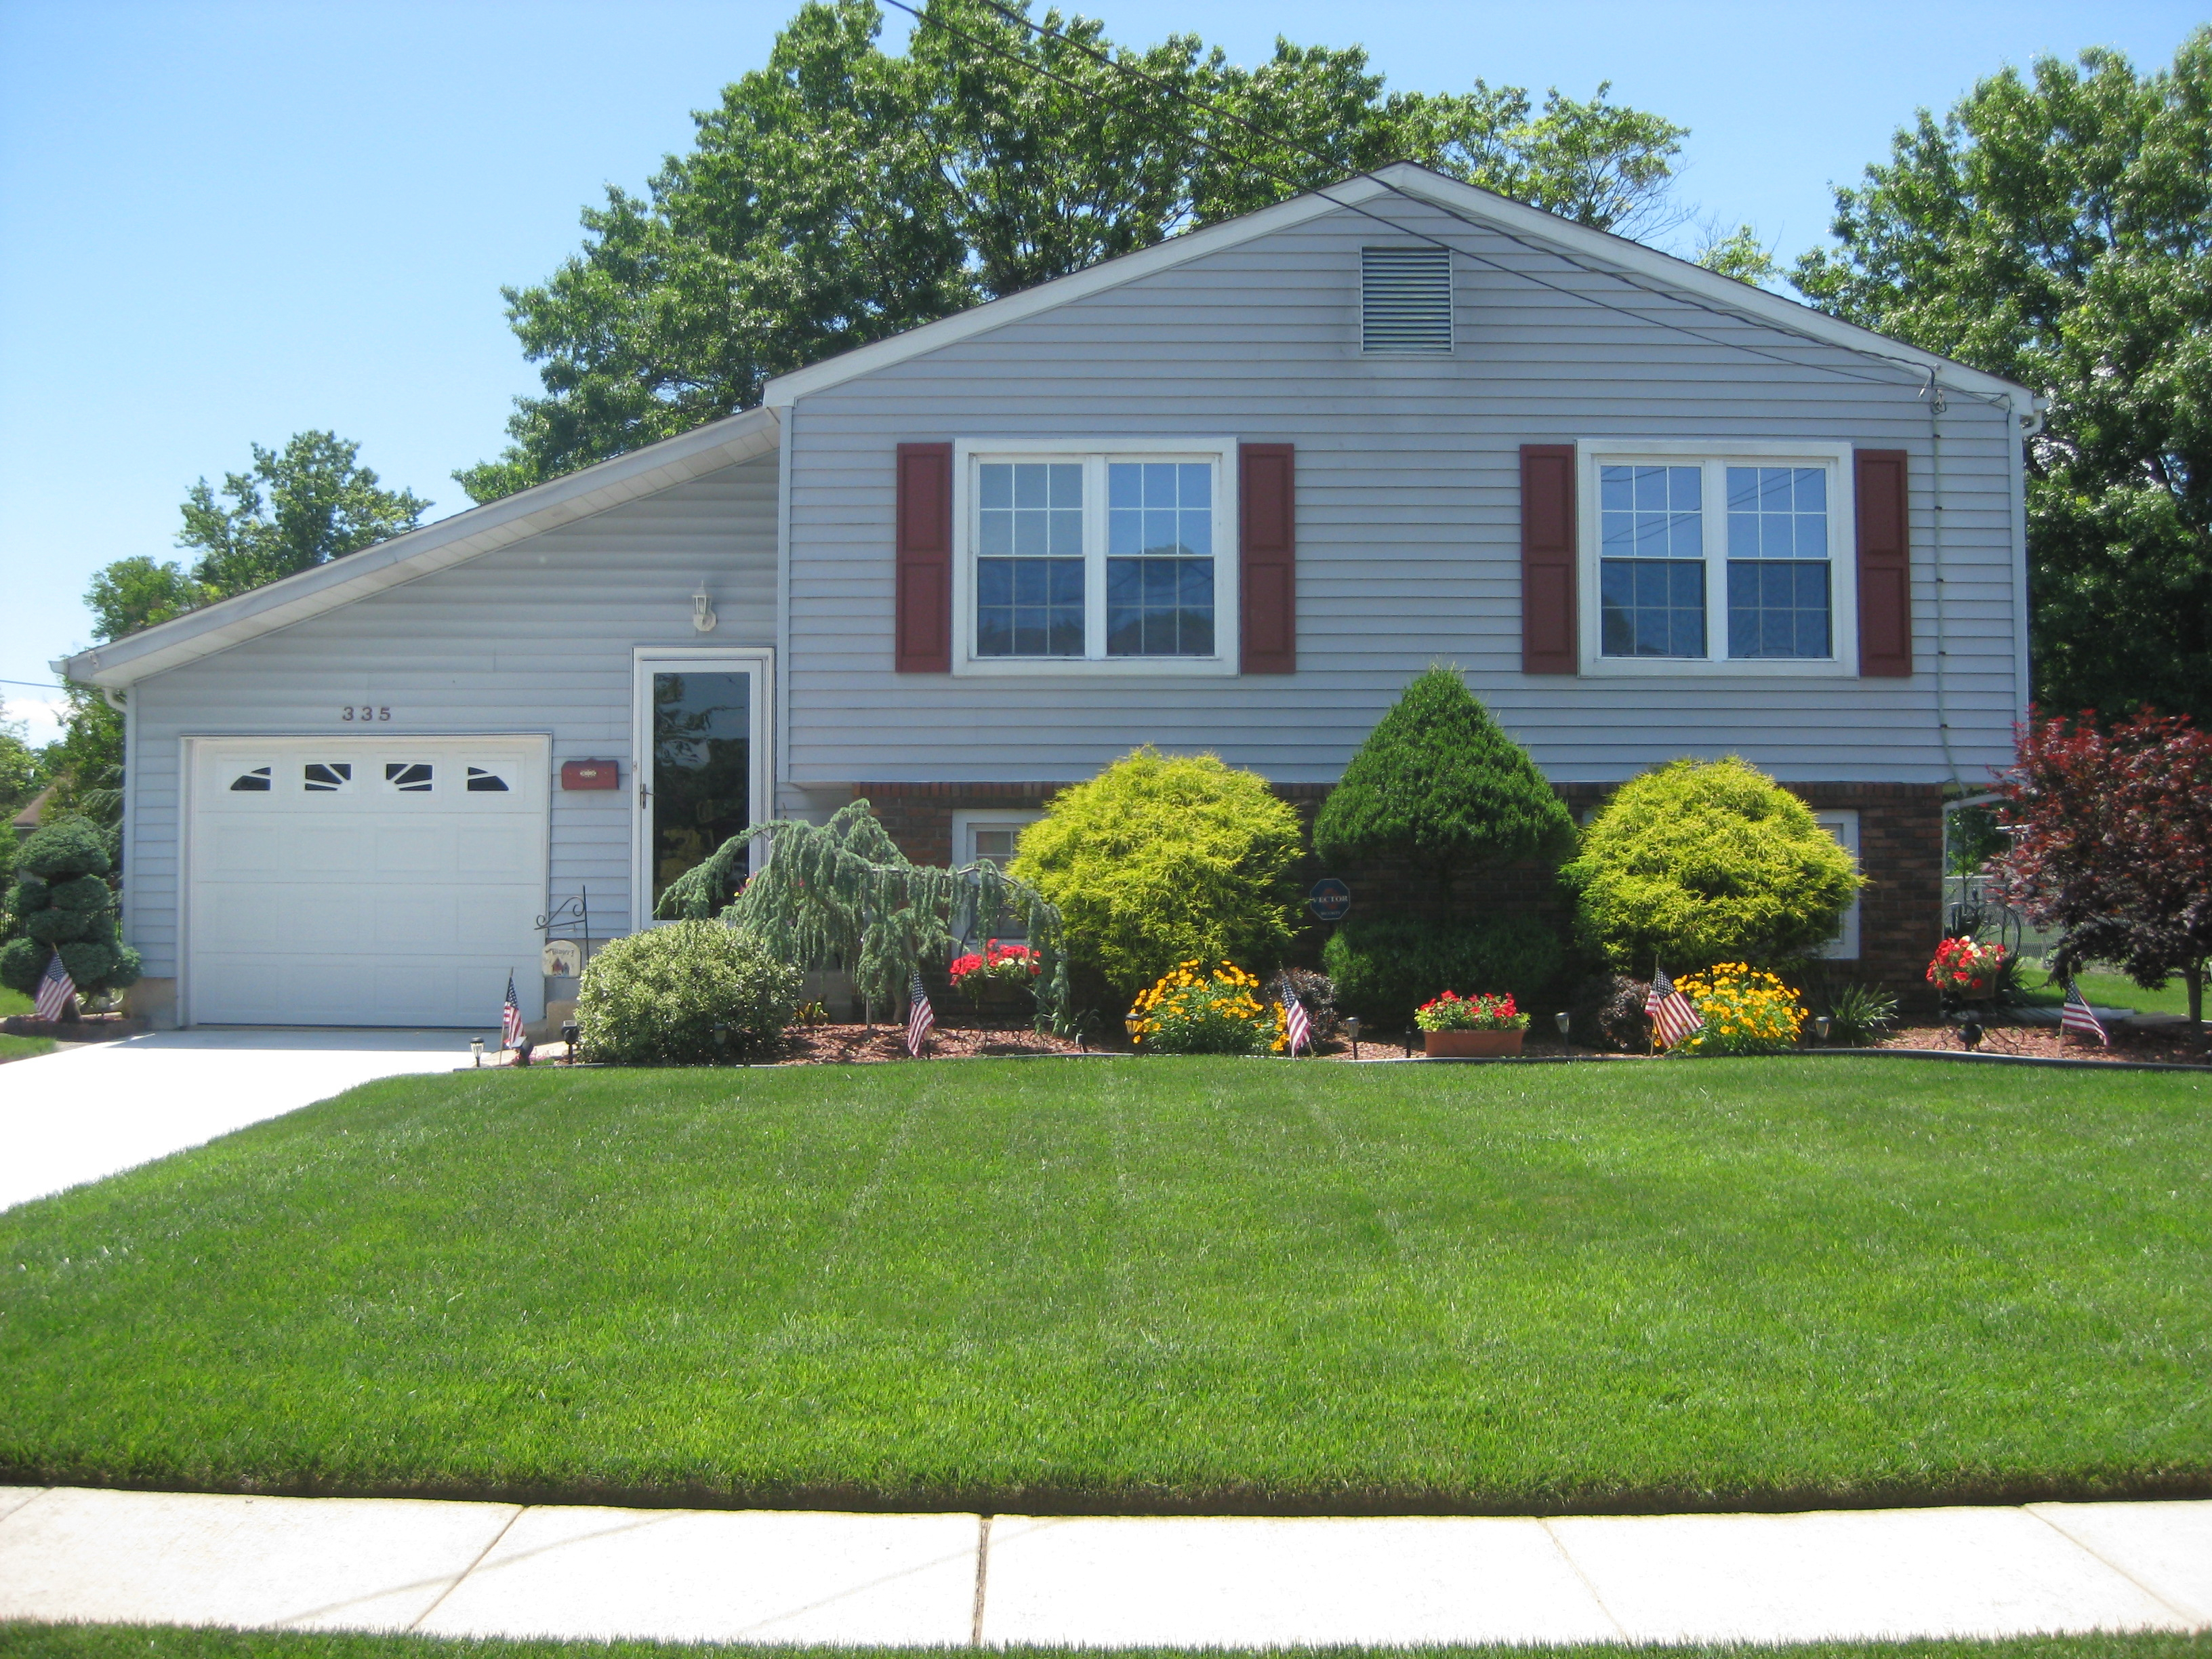 landscaping split level homes @ac46 – roccommunity